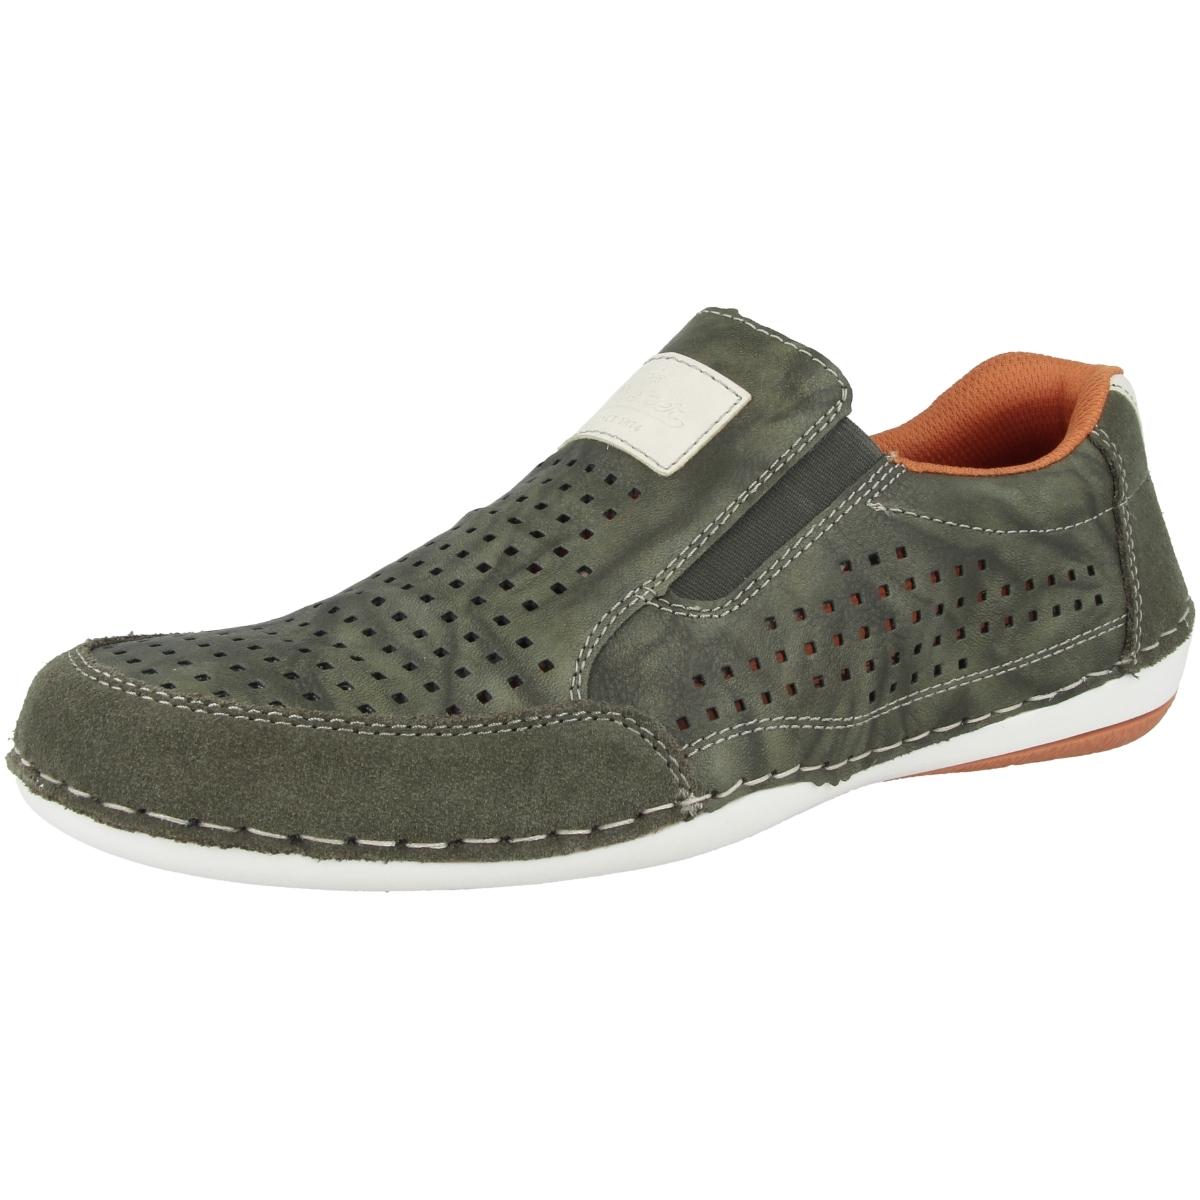 Rieker B9266 56 Schuhe Herren Antistress Freizeit Sneaker MAmam